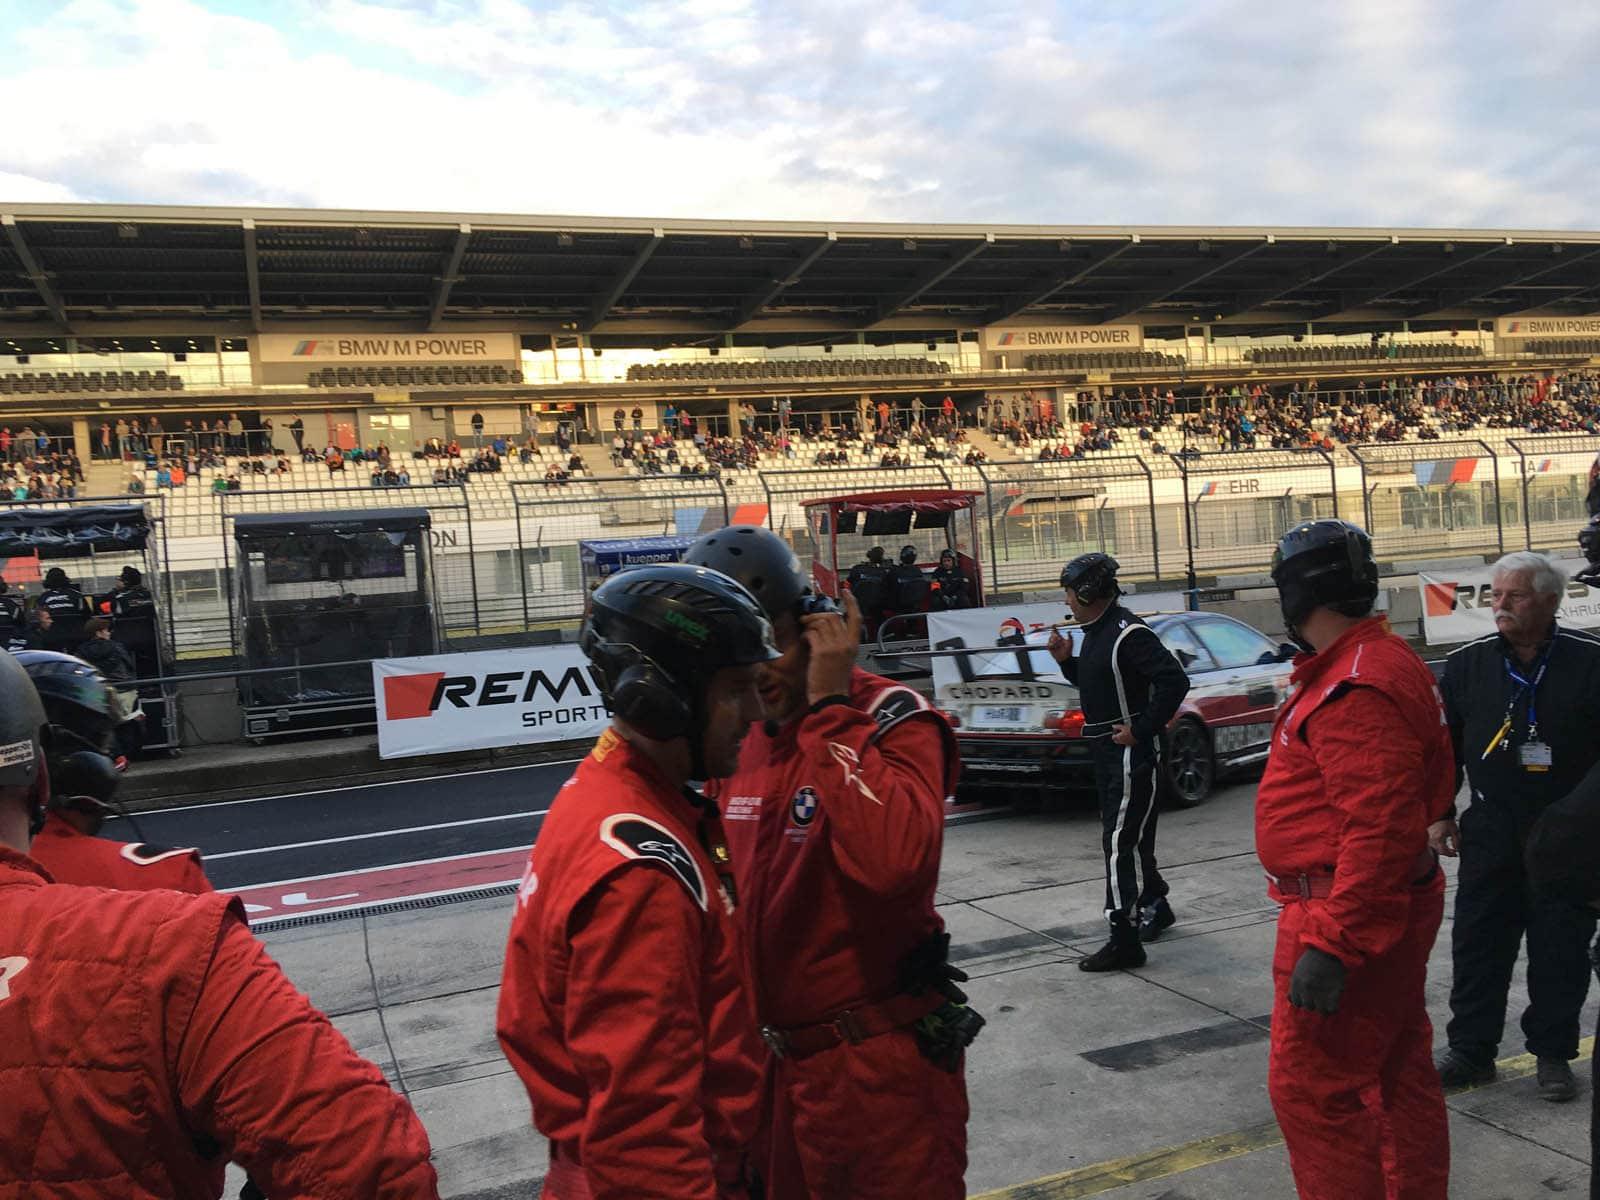 IMG 1953 - 21.-23. Juni 2019 – ADAC TOTAL 24h Rennen – Nürburgring / DE